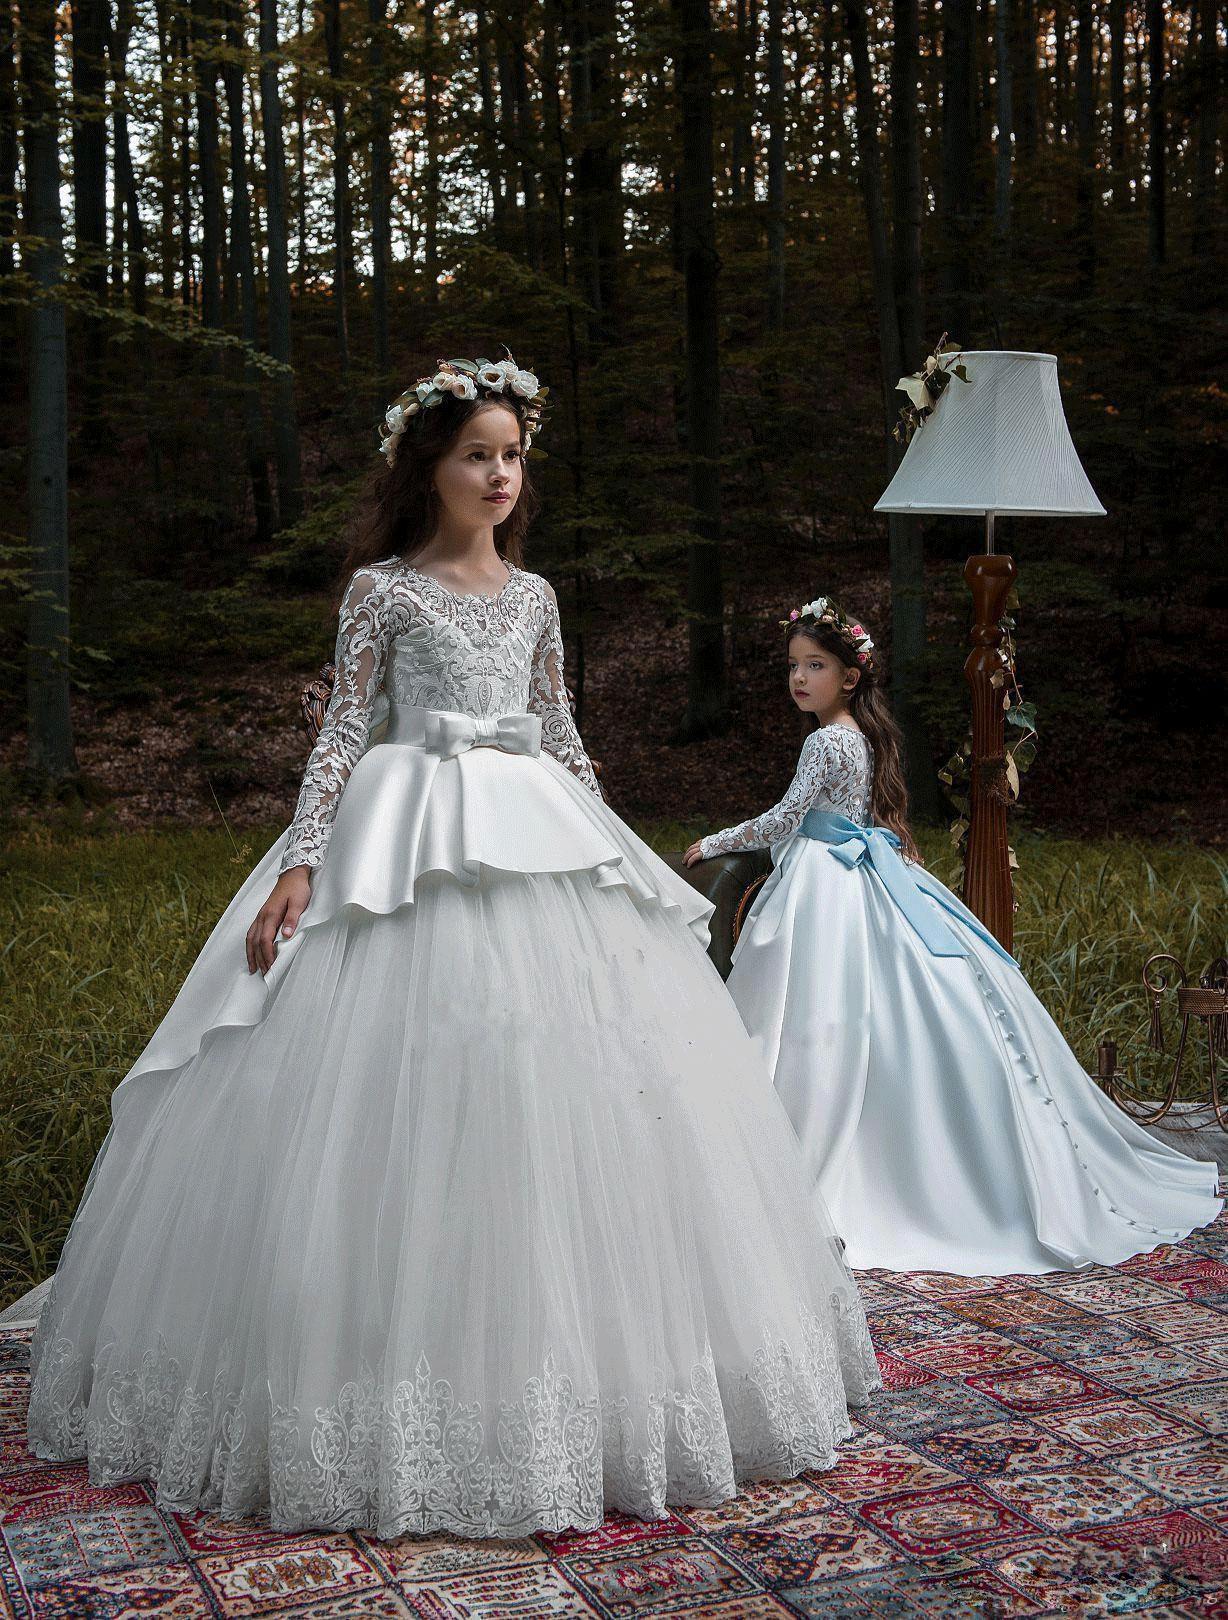 Nuevos vestidos de niñas de flores para bodas de dama de honor de princesa Vestido de fiesta Tren de barrido Vestido de primera comunión de niña barata TF01